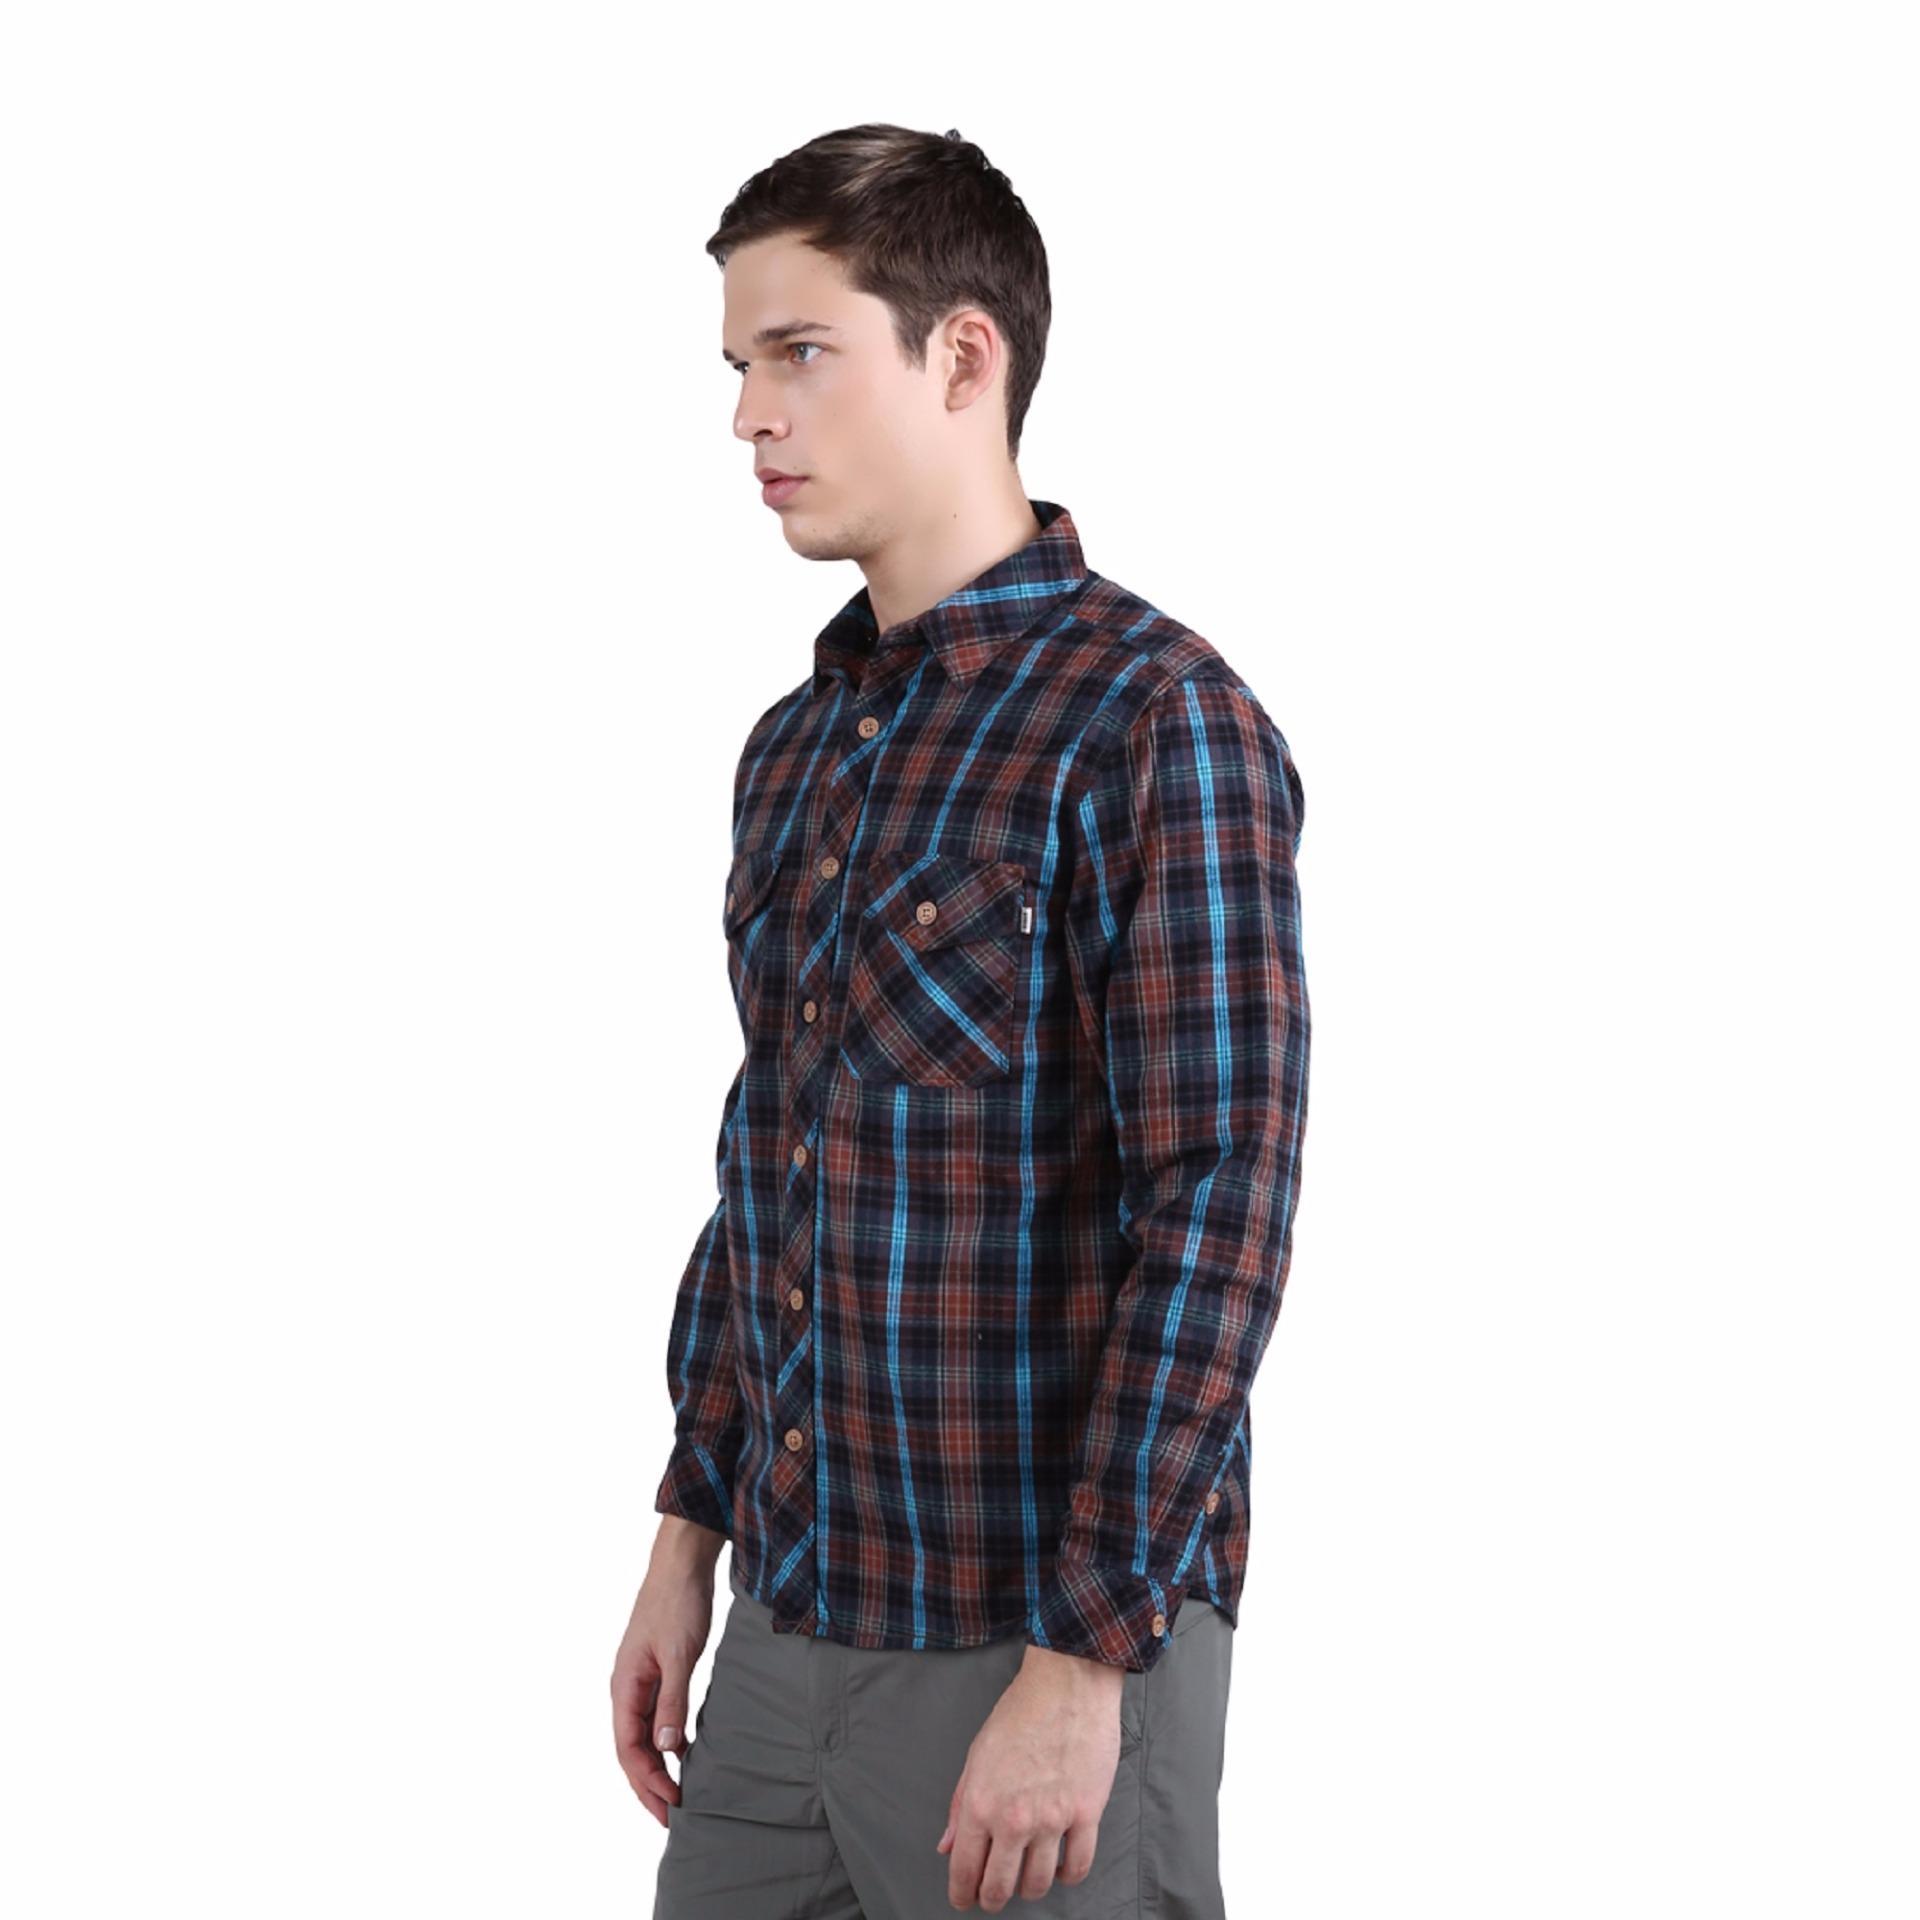 Eiger Celana Basic Five P Khaki Daftar Harga Terkini Dan Riding Sentra  Pants Olive Panjang Pria Hijau 29 Ls Montana Flanel Brown Blue